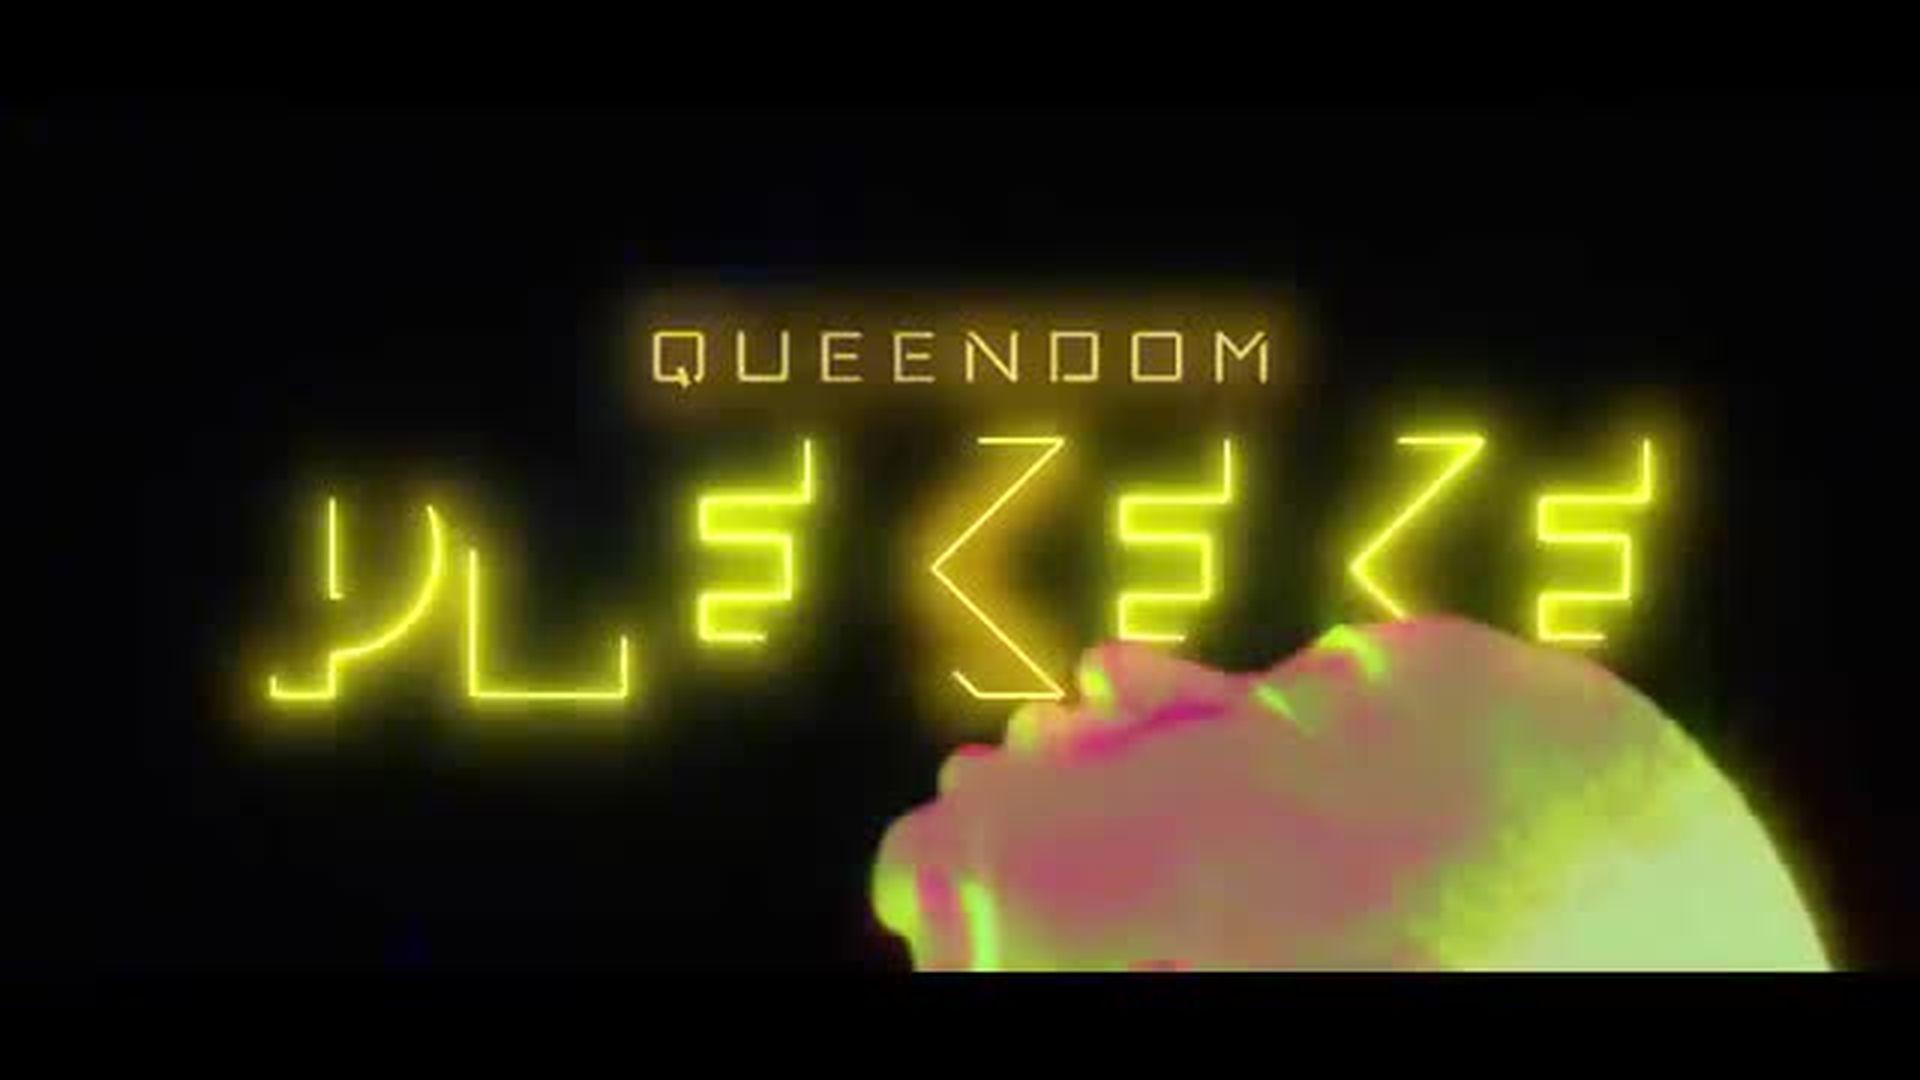 THE QUEENDOM - PLEKEKE